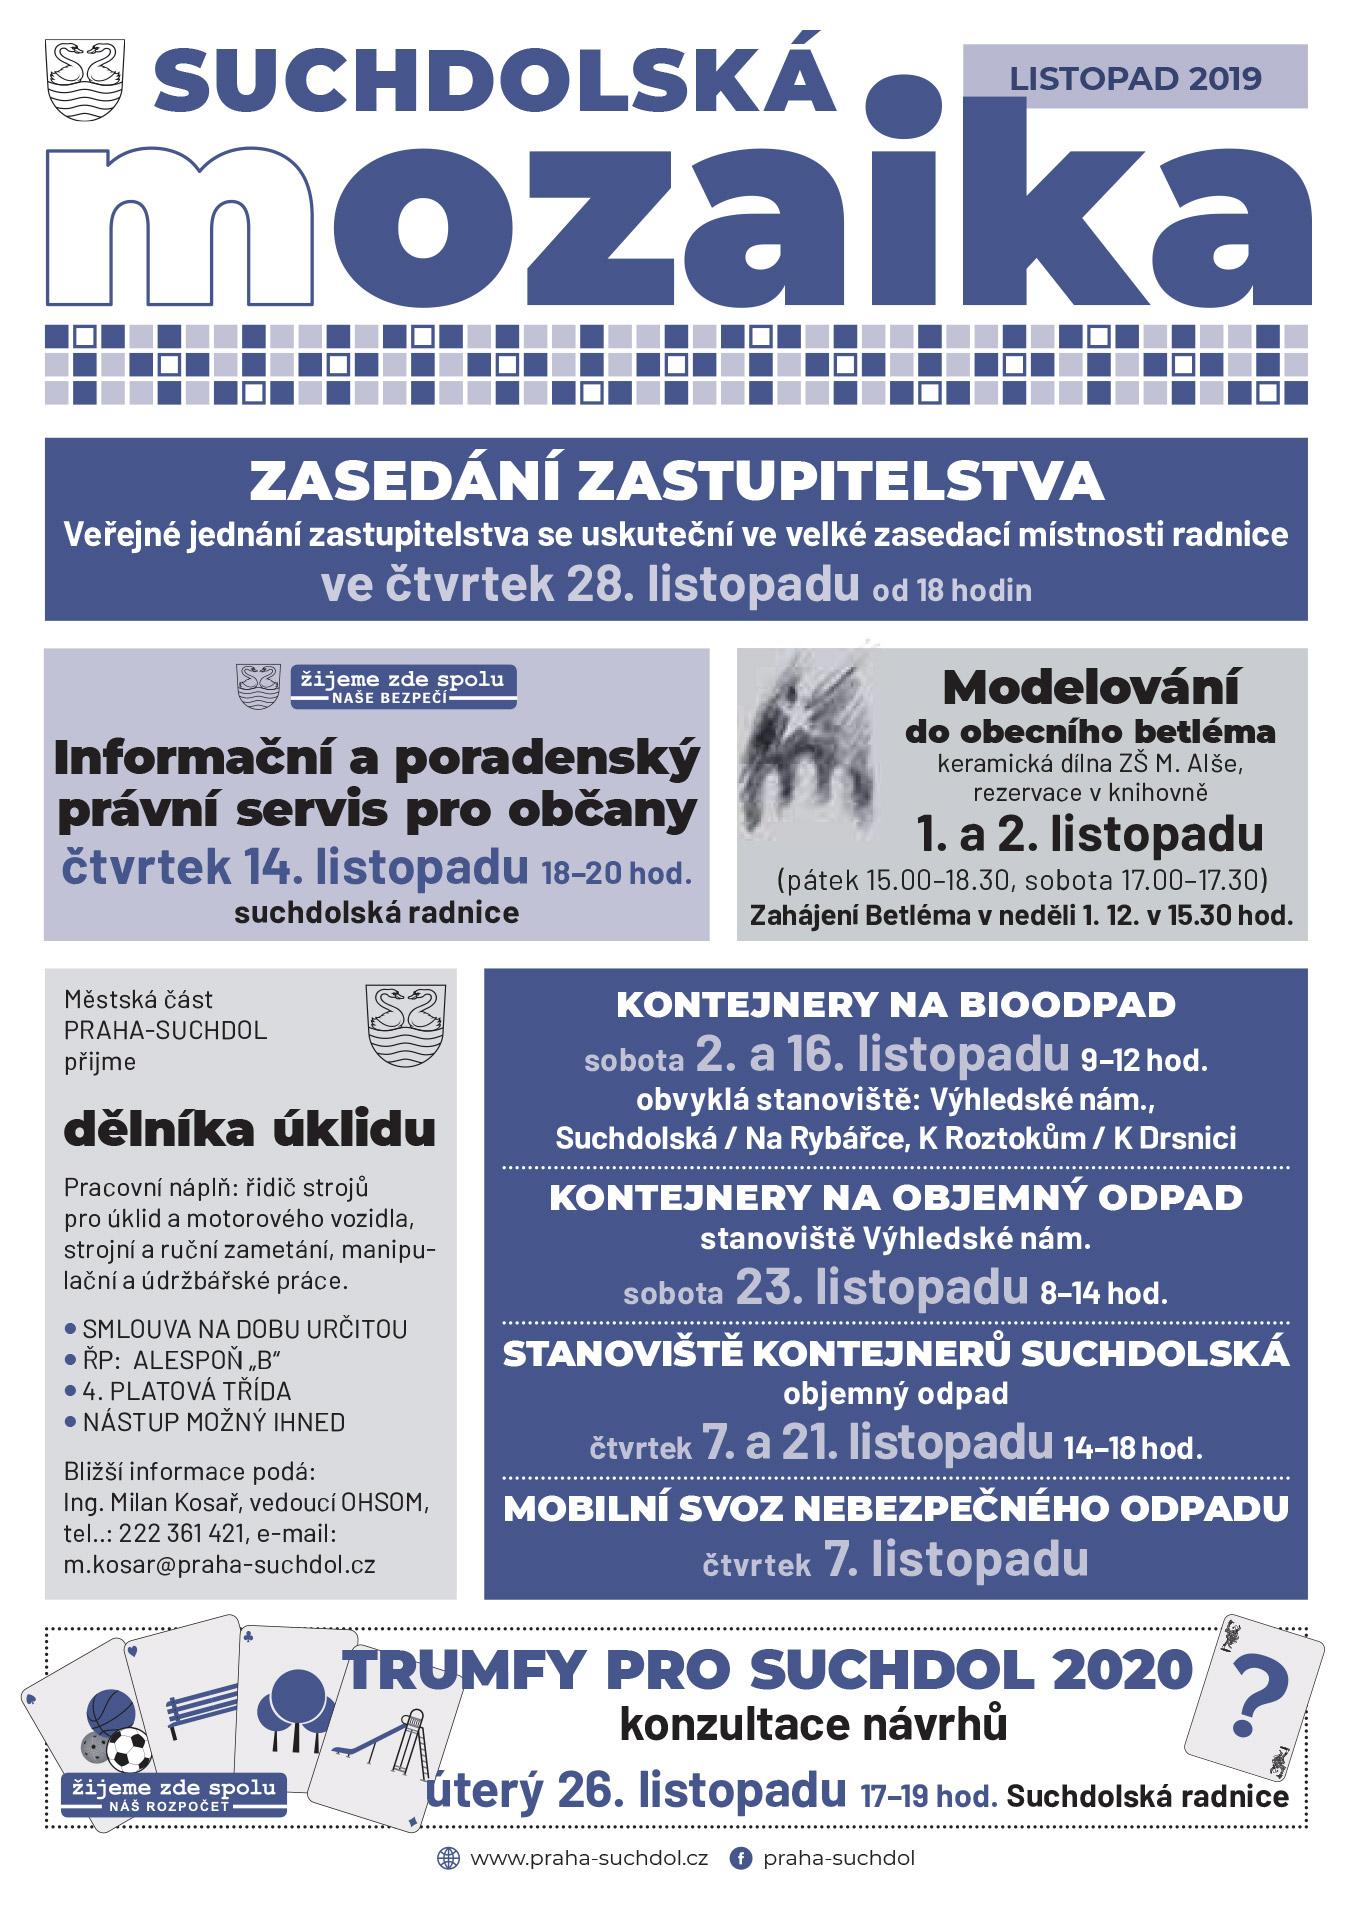 Suchdolská mozaika 11/2019